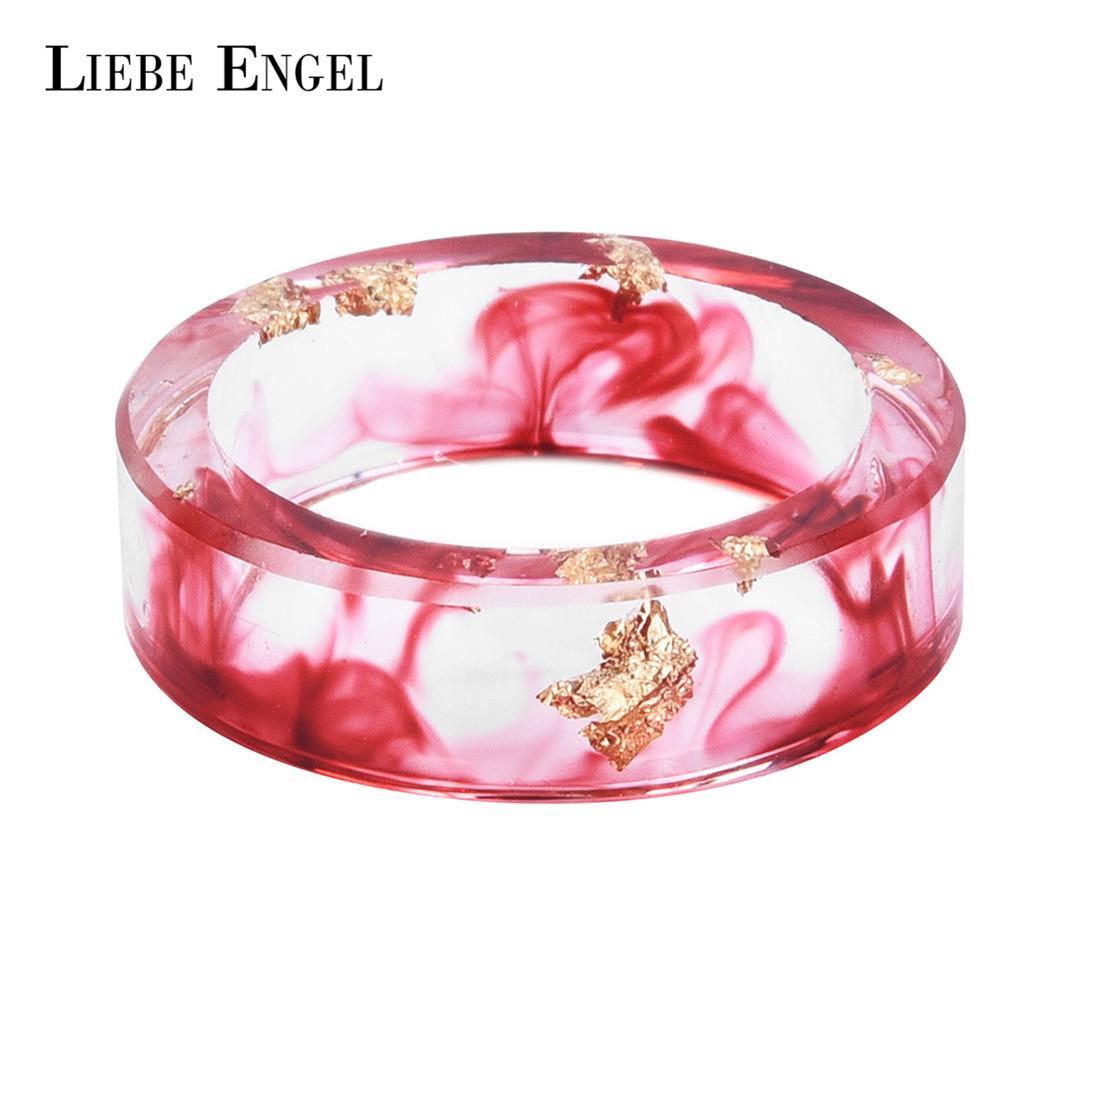 2018 Liebe Engel Hot Sale Gold Foil Paper Inside Resin Ring For ...